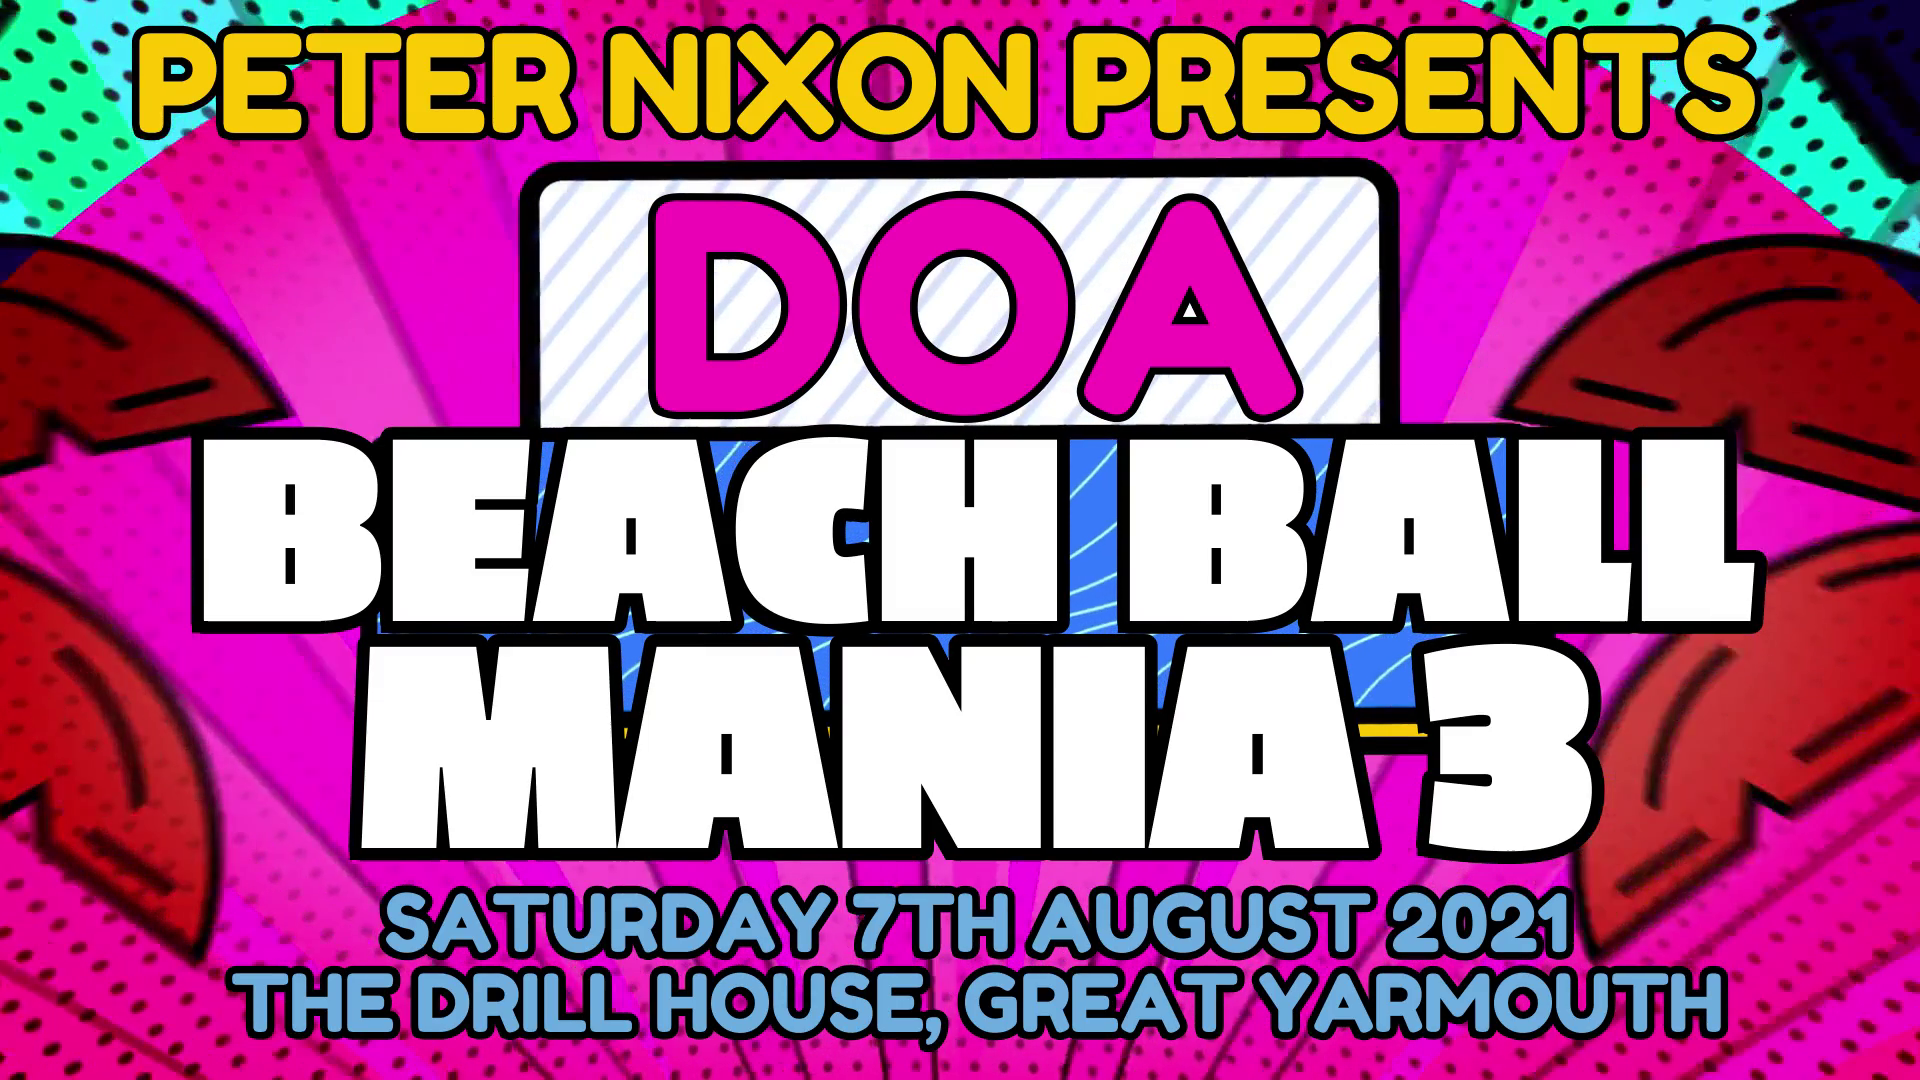 DOA Beach Ball Mania 3 event description image